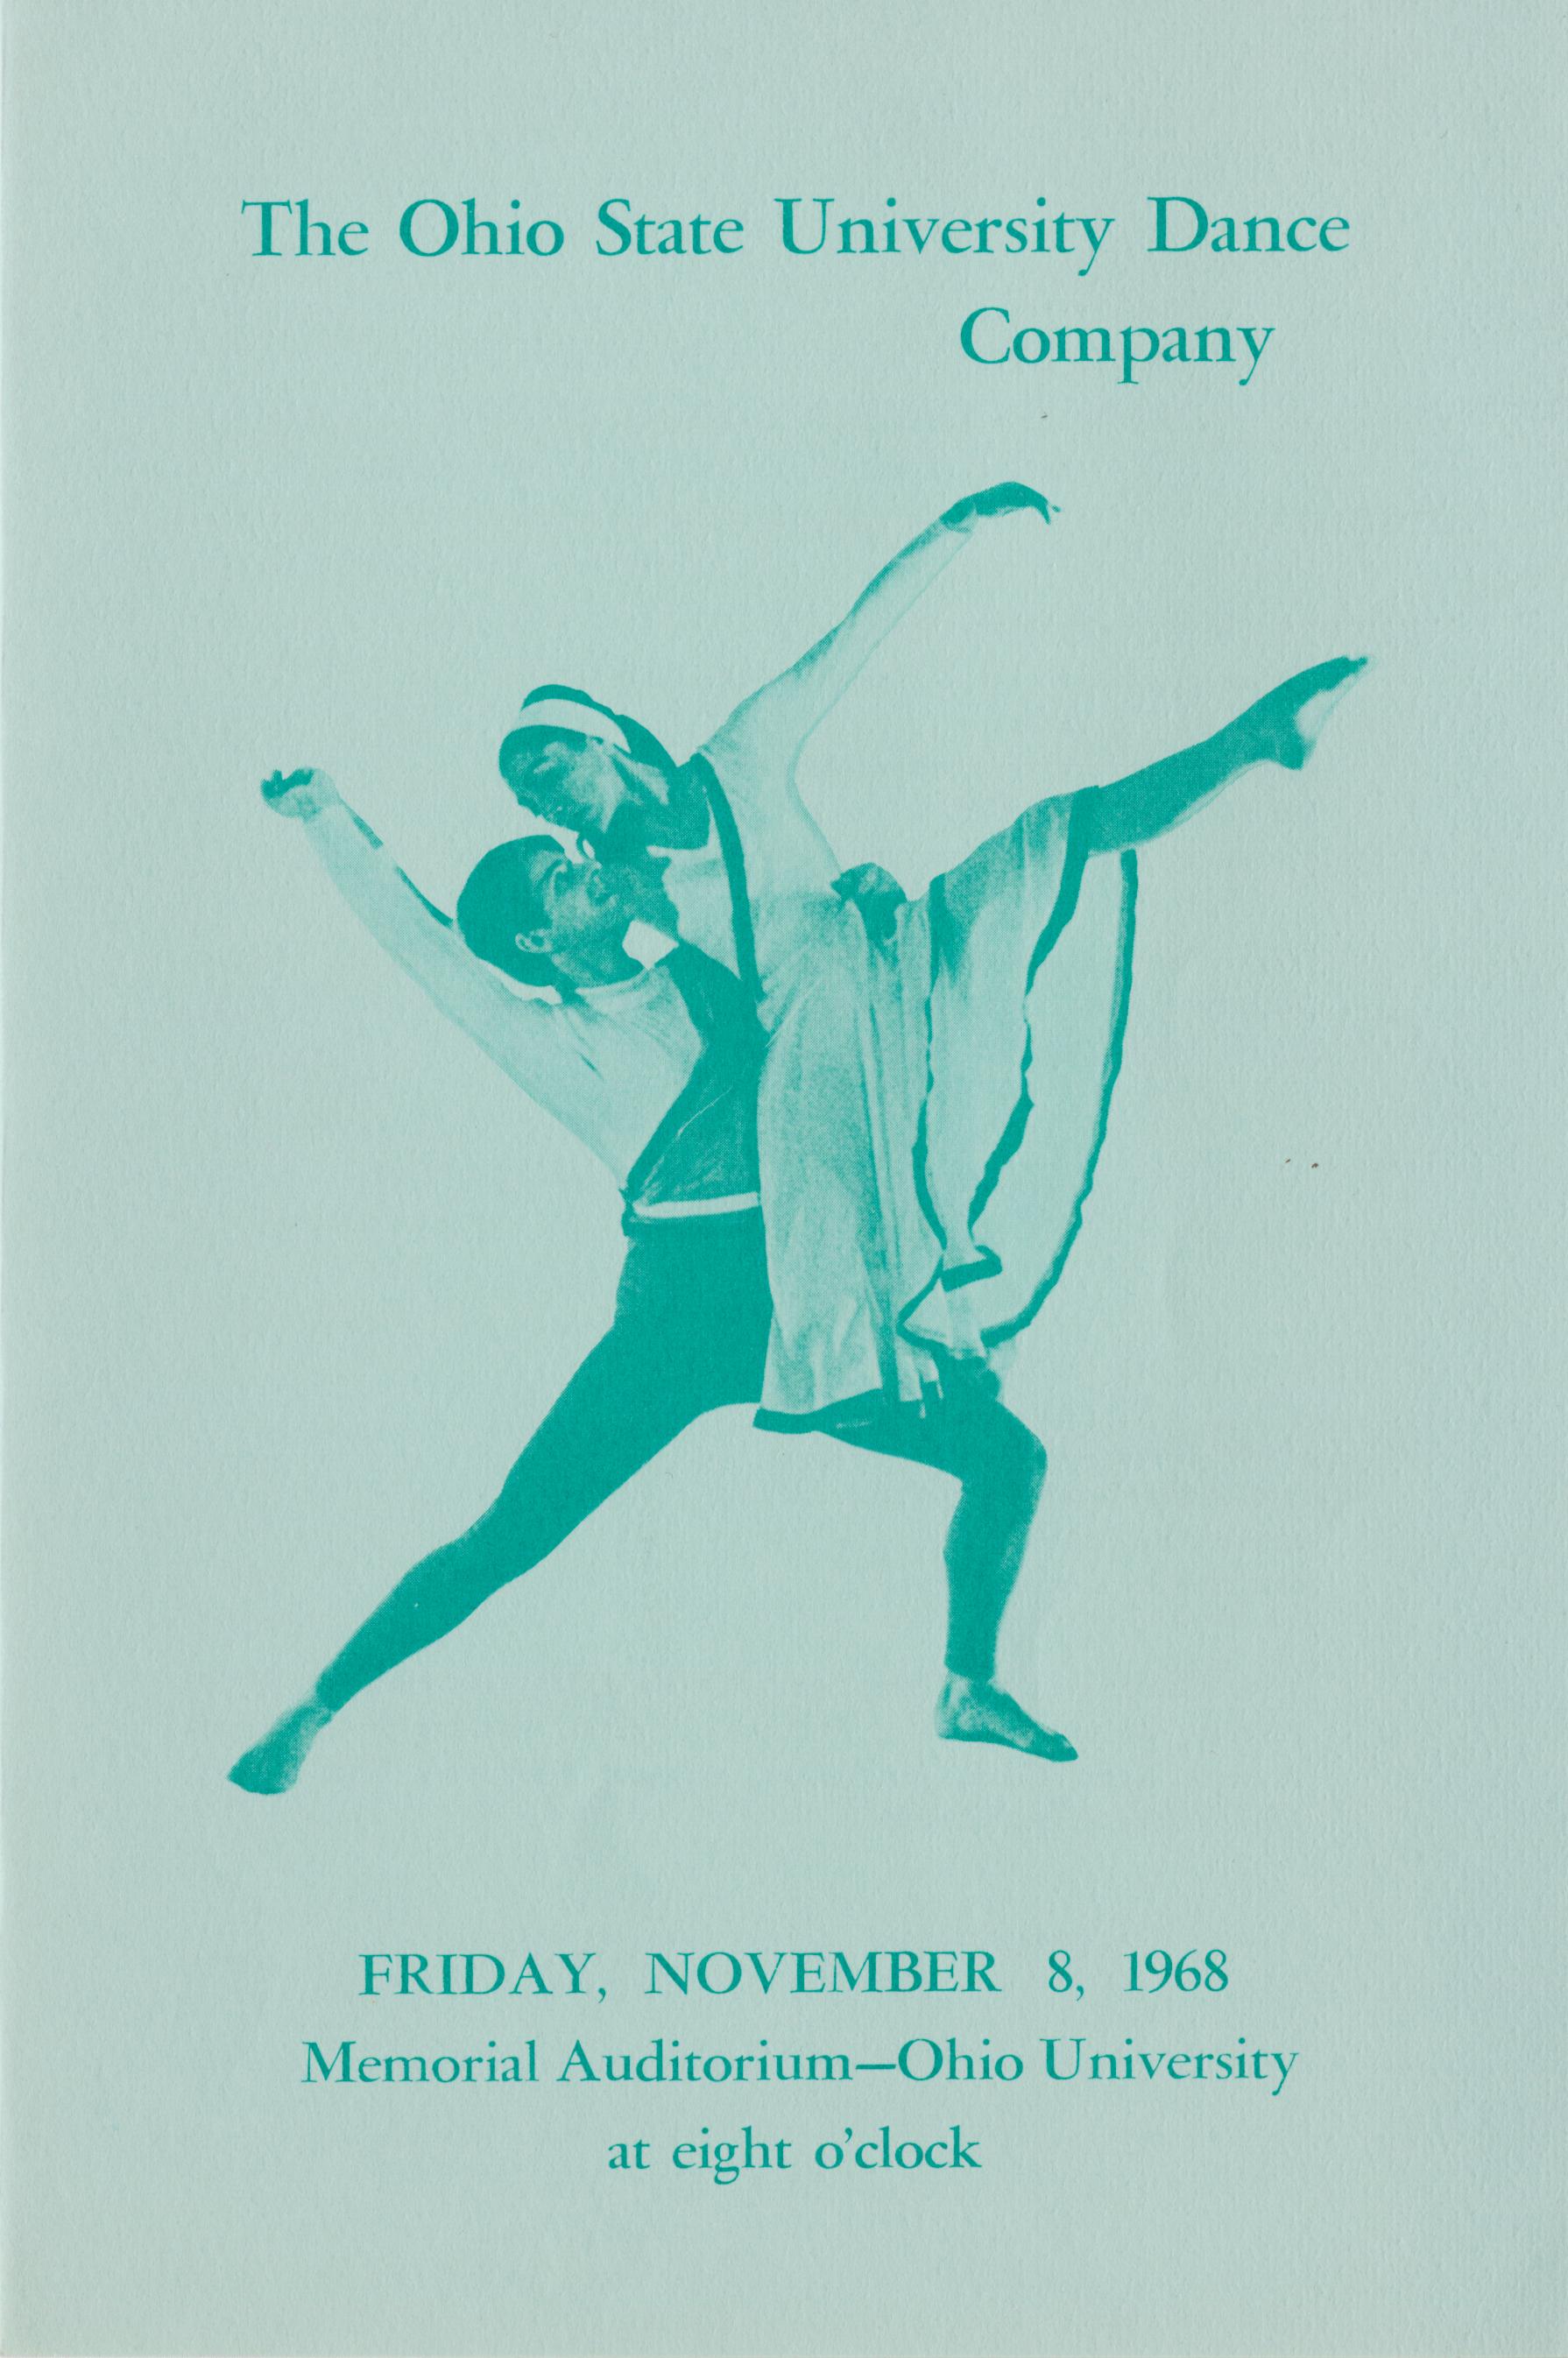 UDC_1968.2_DancePrograms-015-001.jpg